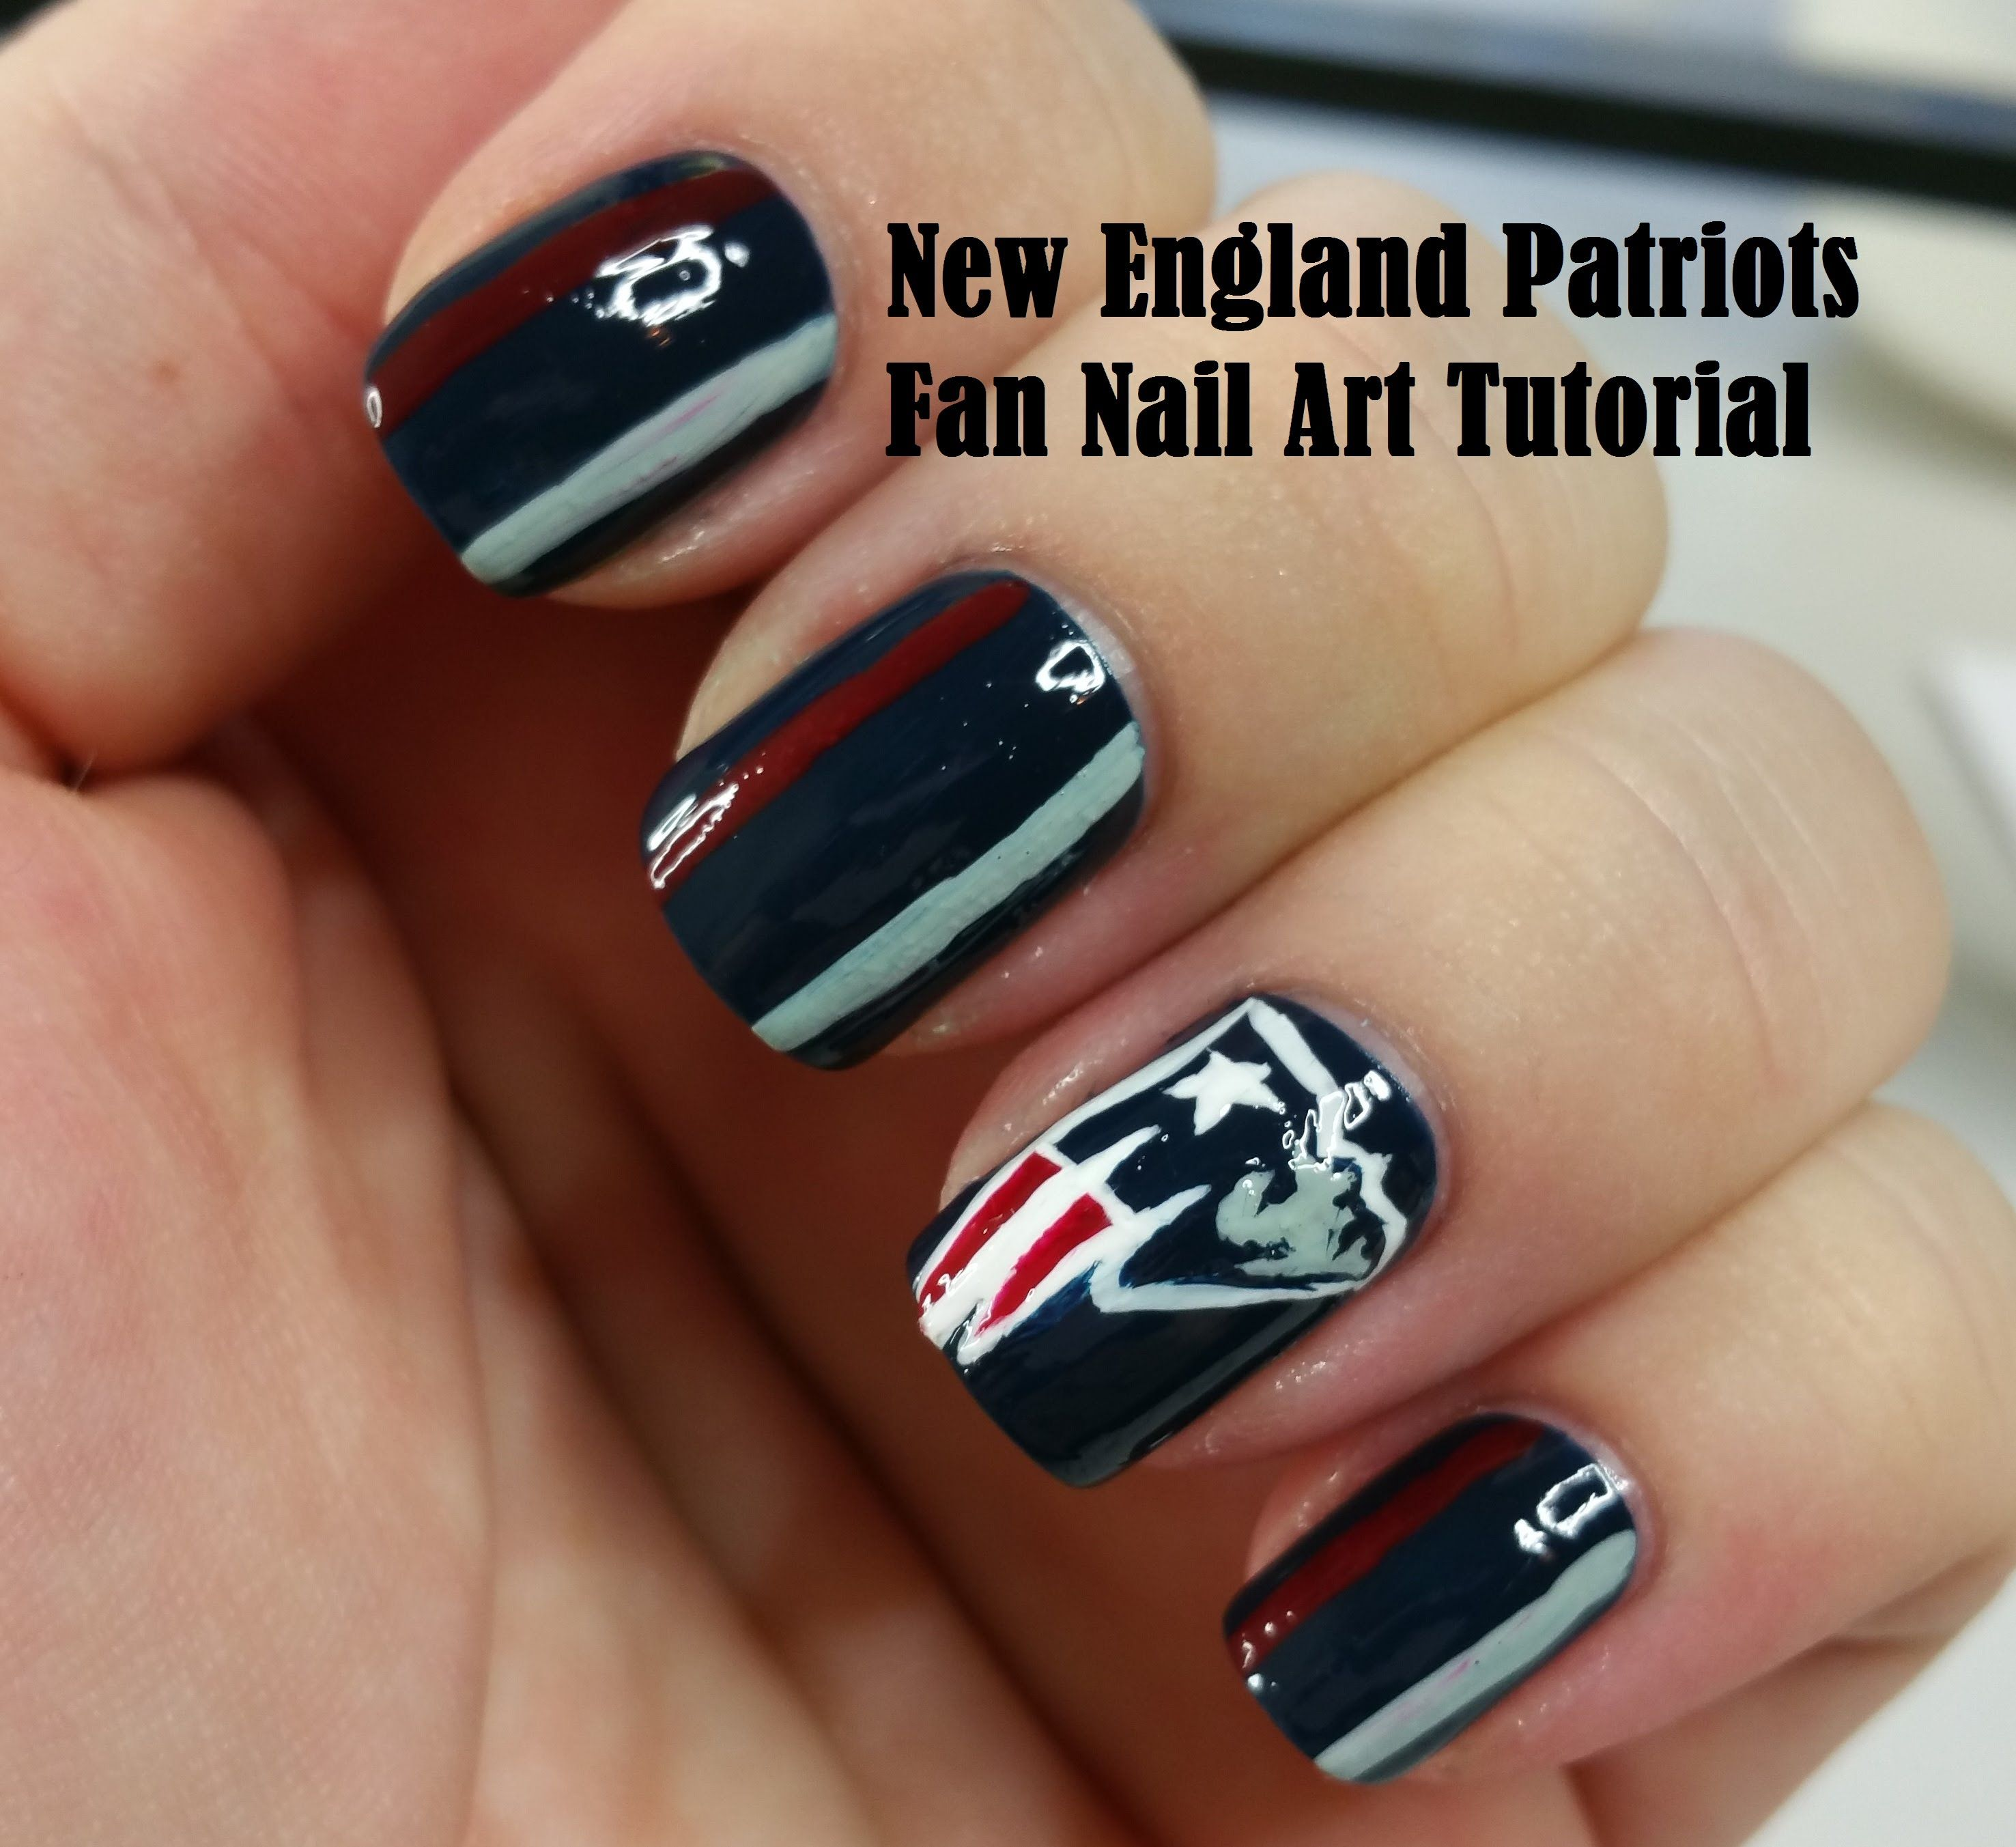 New England Patriots Fan Nail Art Tutorial Patriotic Nails Design Patriots Nail Art Fan Nails